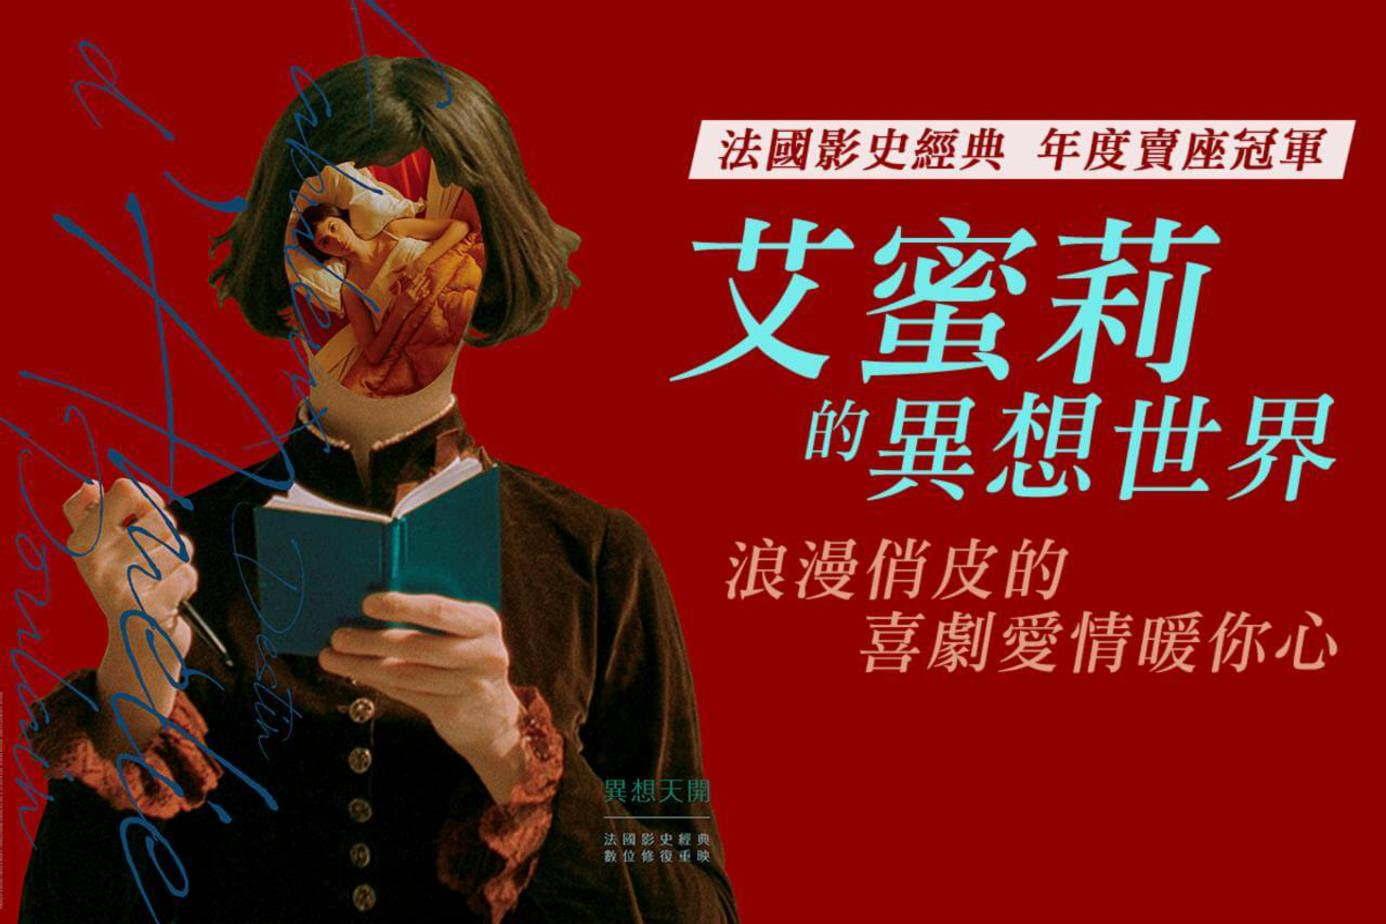 Movie, Le fabuleux destin d'Amélie Poulain(法國, 2001年) / 艾蜜莉的異想世界(台灣) / 天使愛美麗(香港) / Amelie(英文), 電影海報, 台灣, 橫版